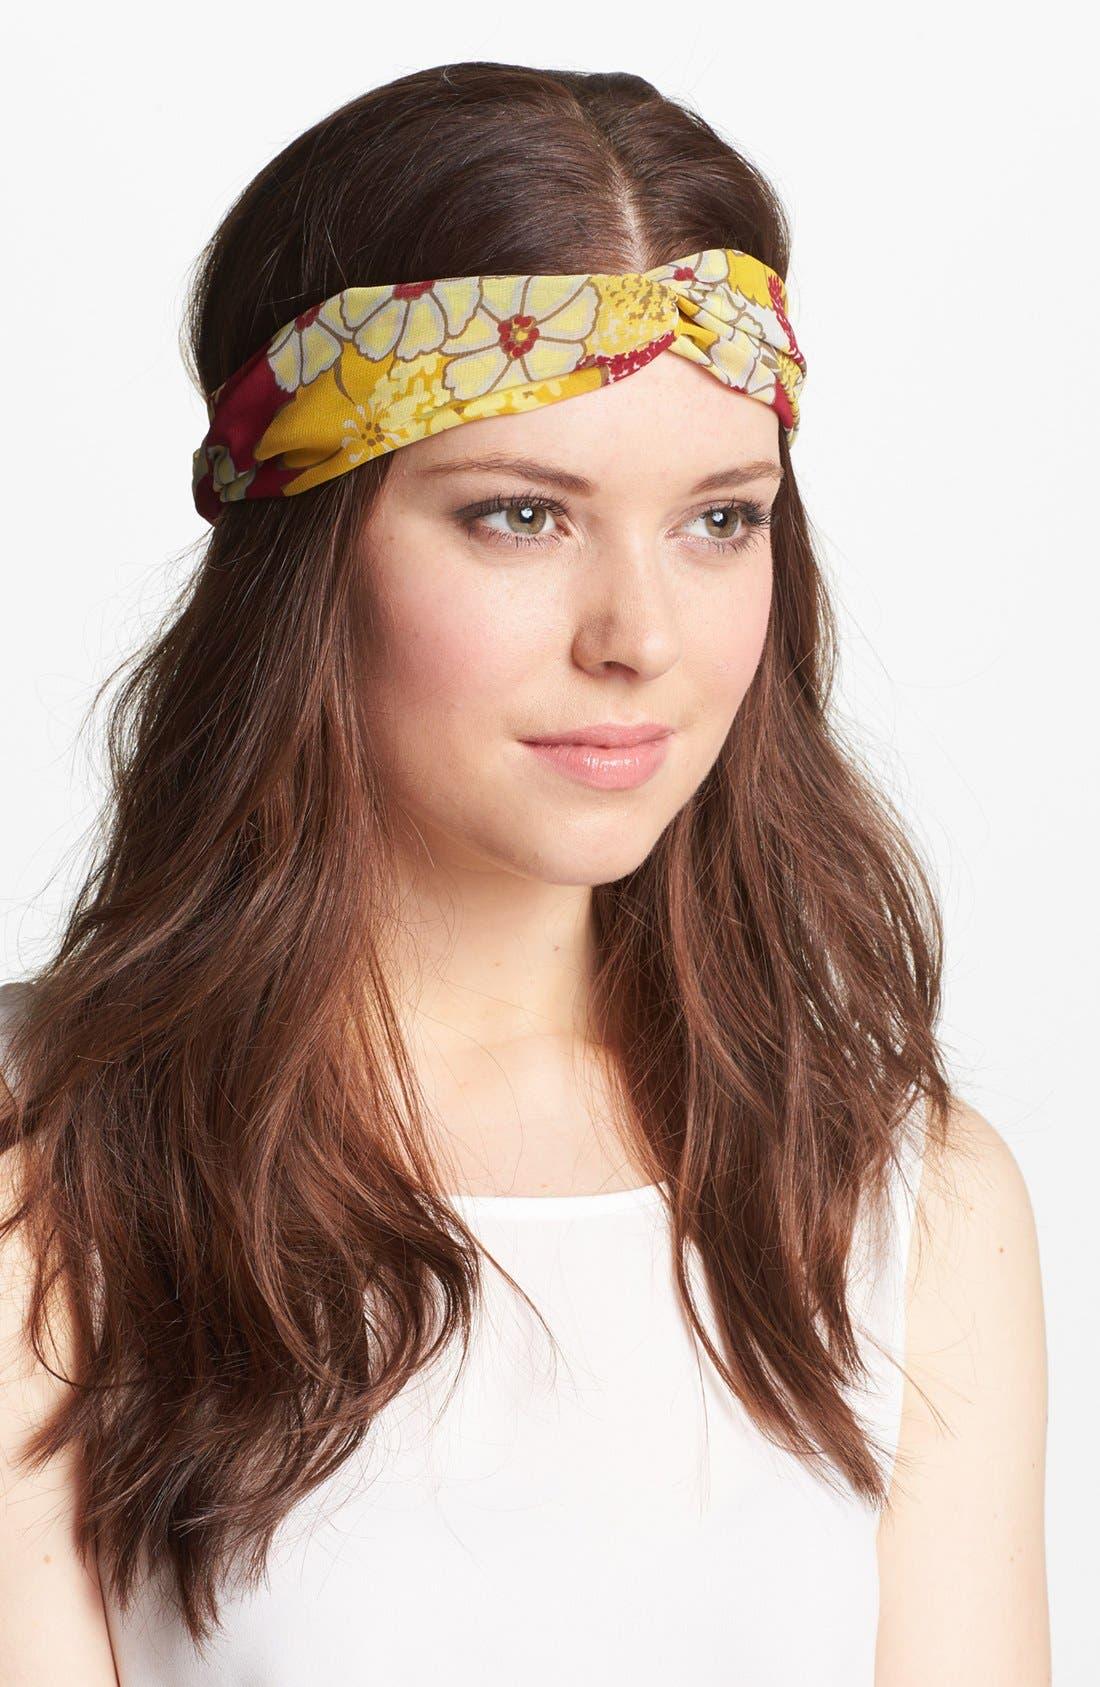 Main Image - Tasha 'Floral Interlock' Turban Head Wrap